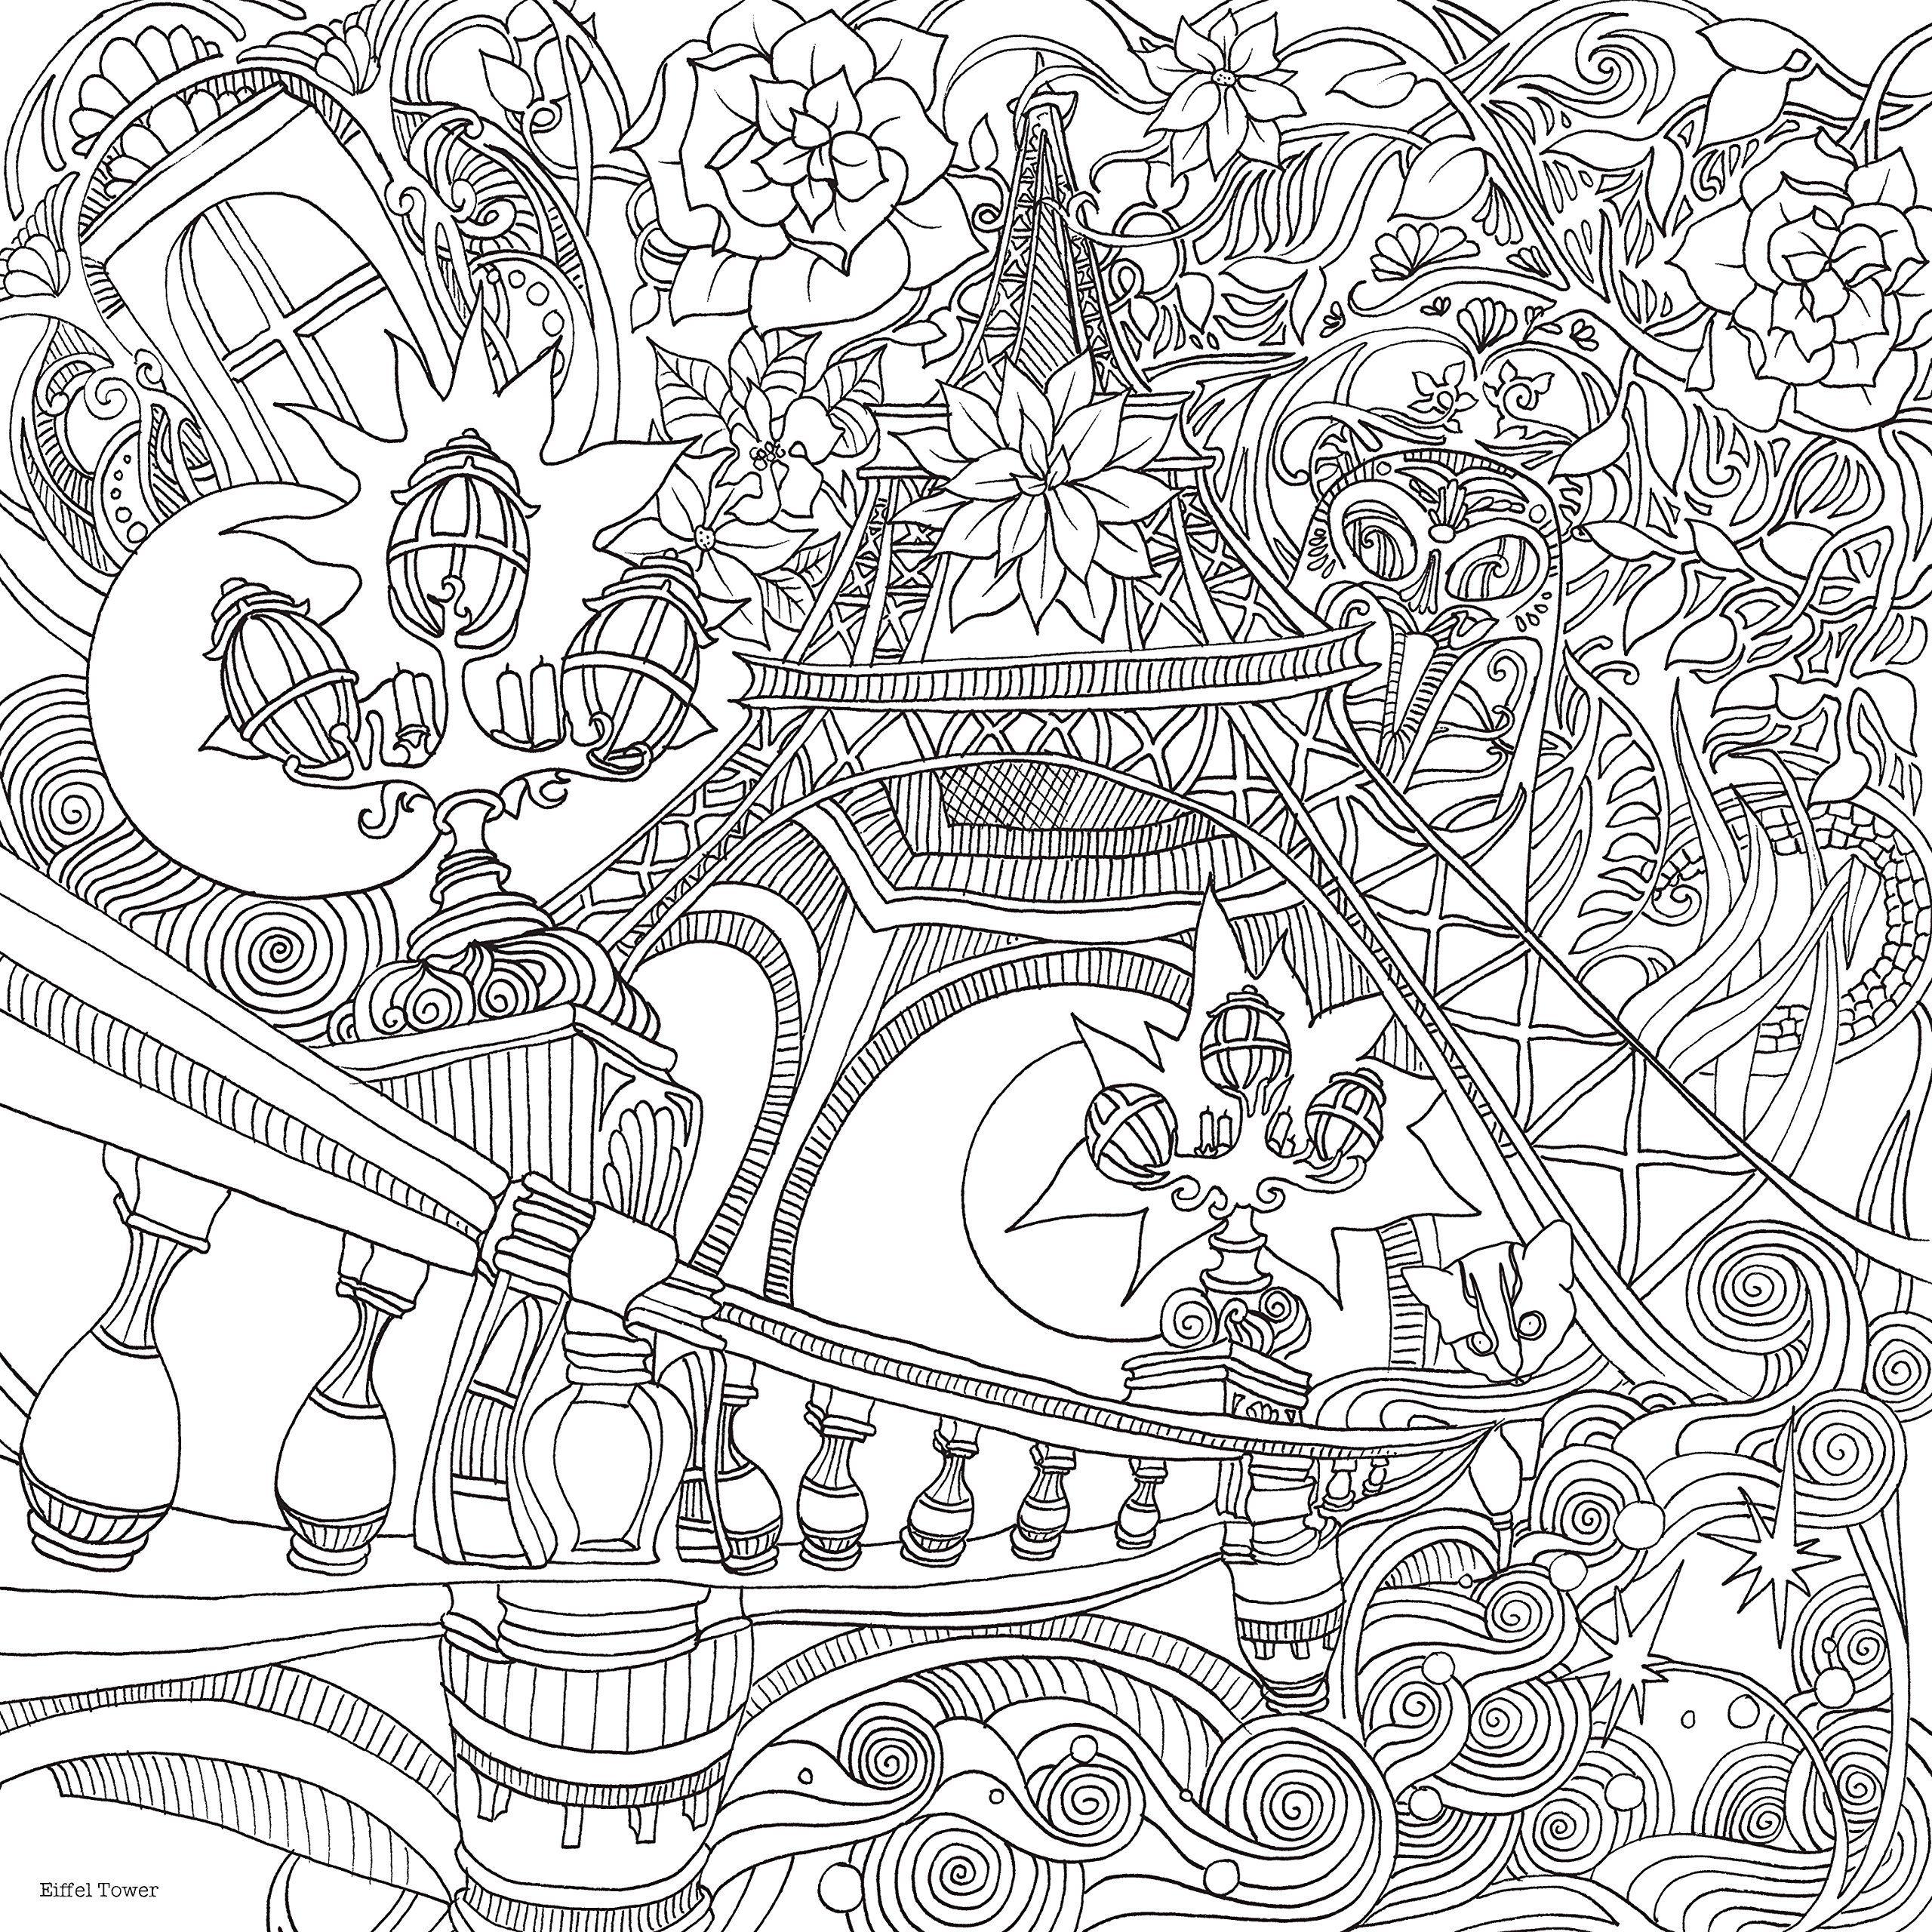 the magical city a colouring book (magical colouring